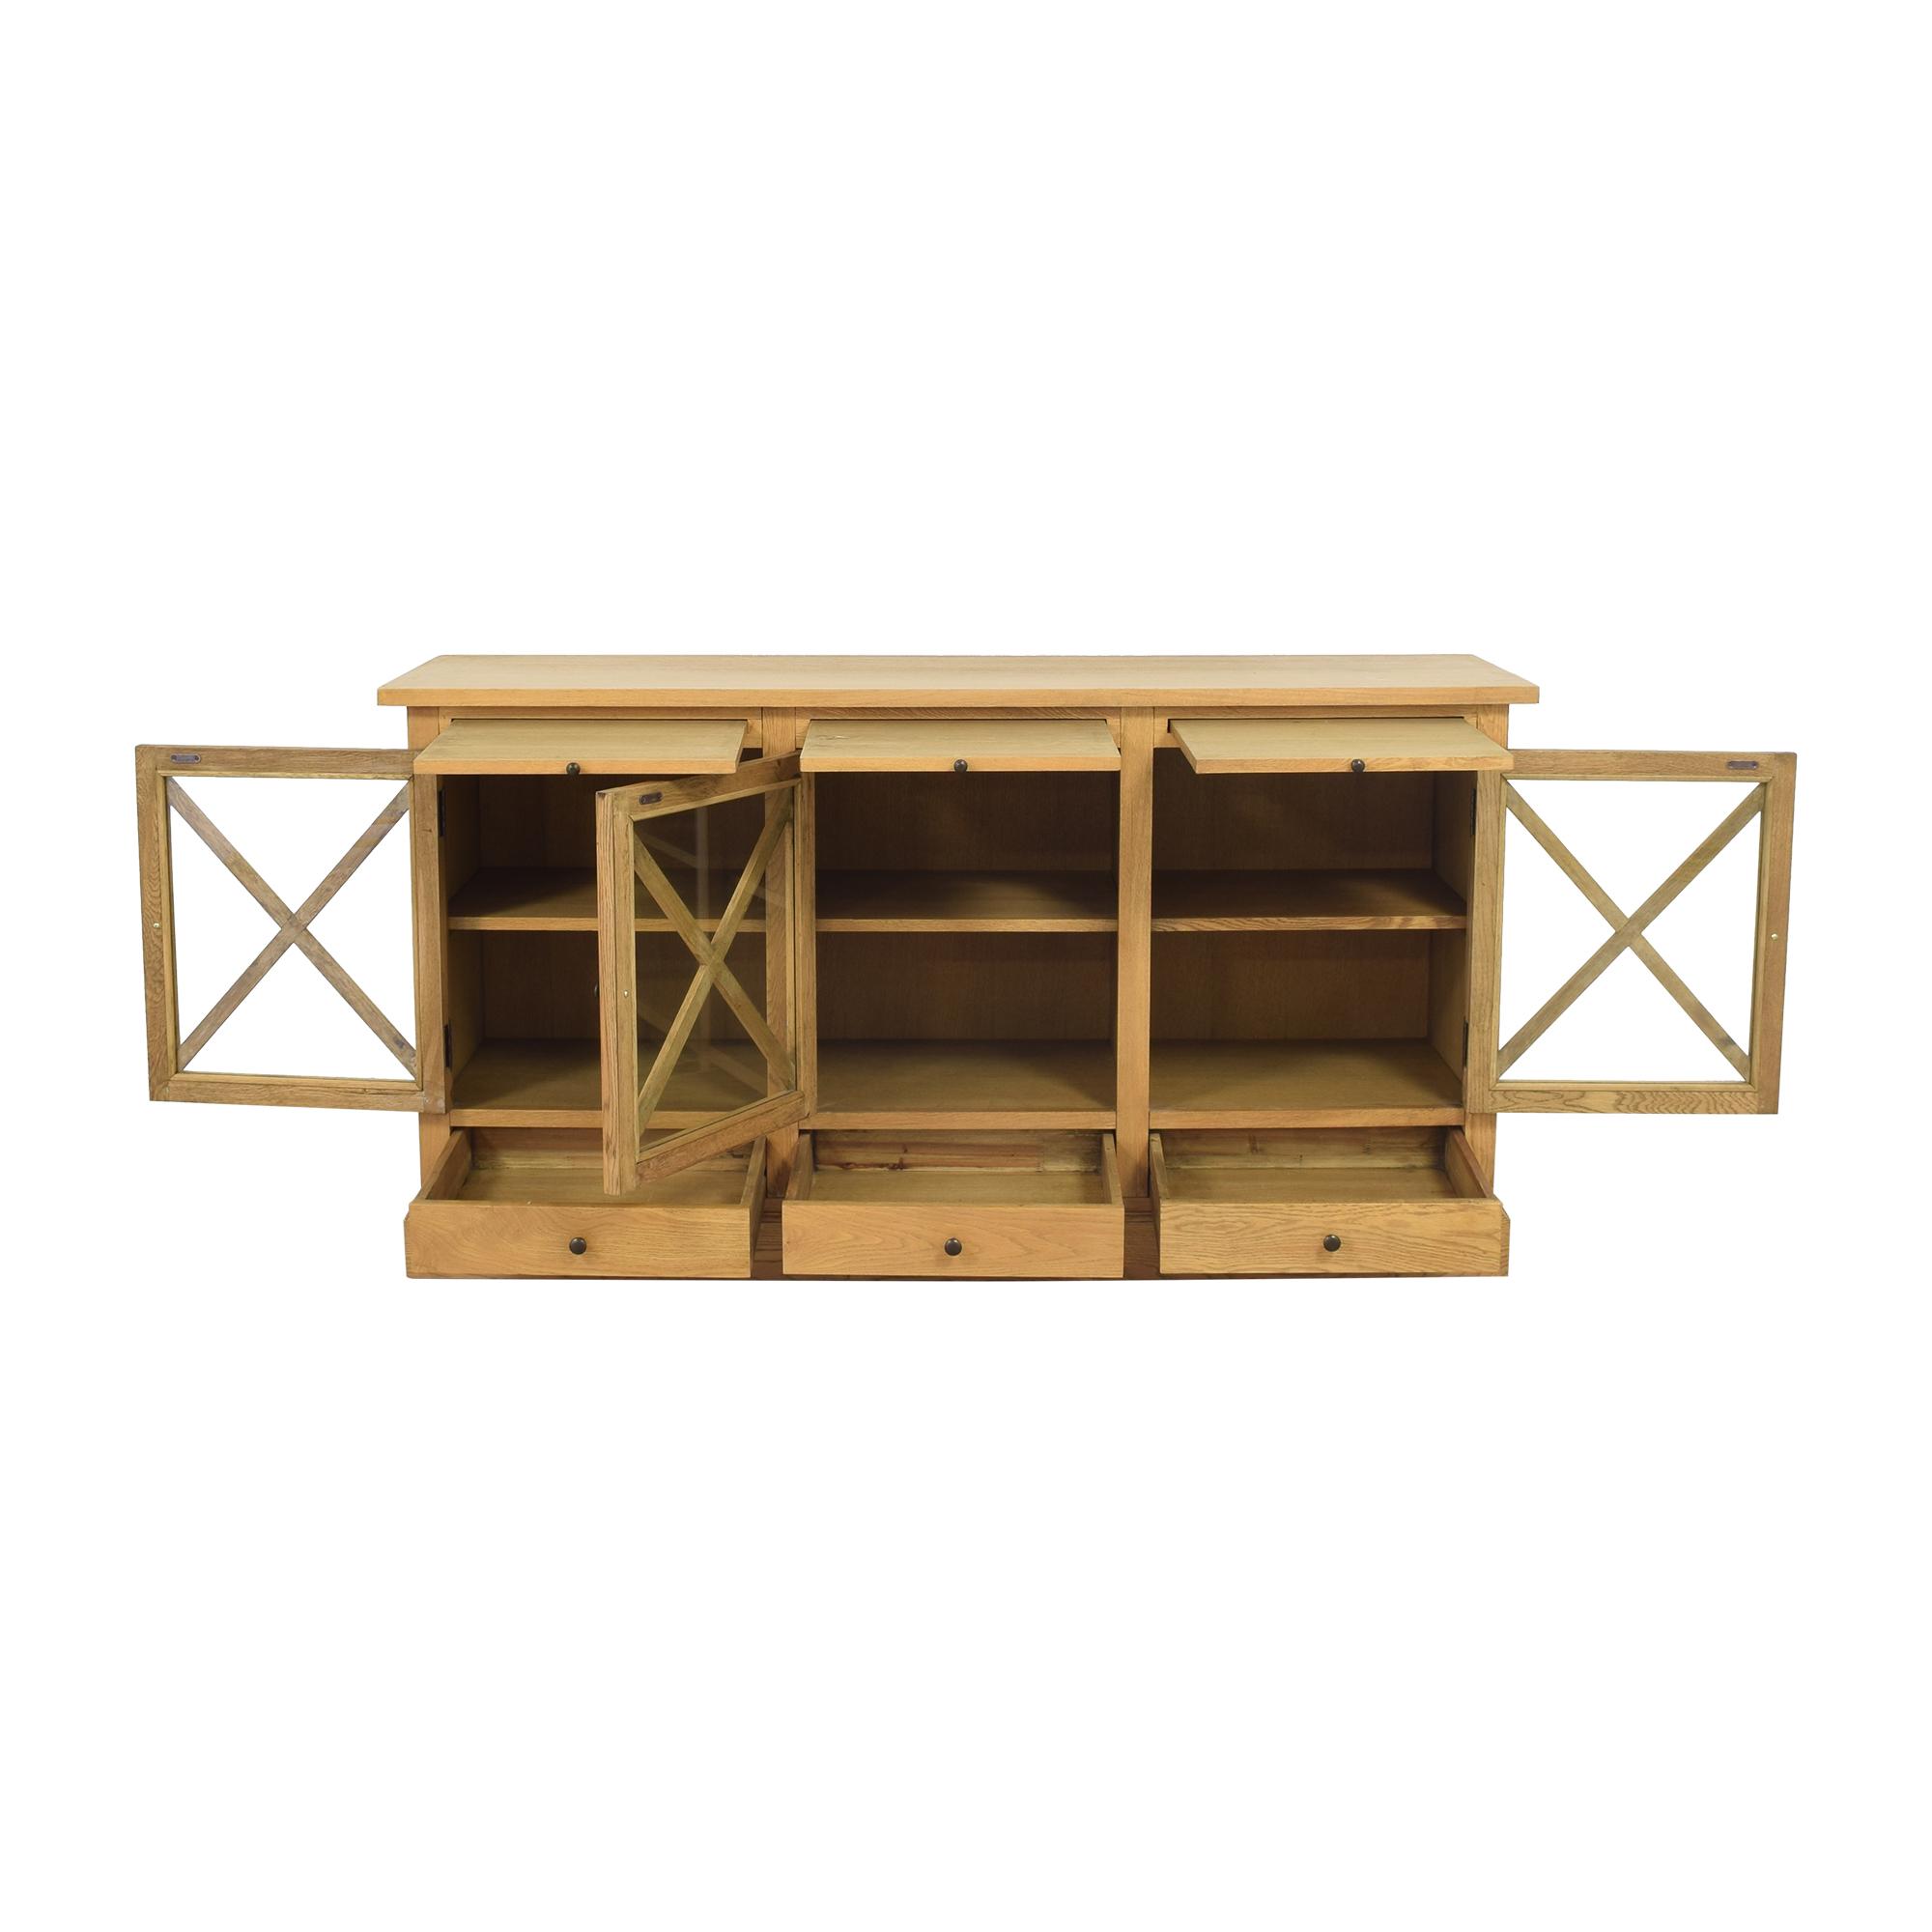 Ballard Designs Belgard Console / Cabinets & Sideboards